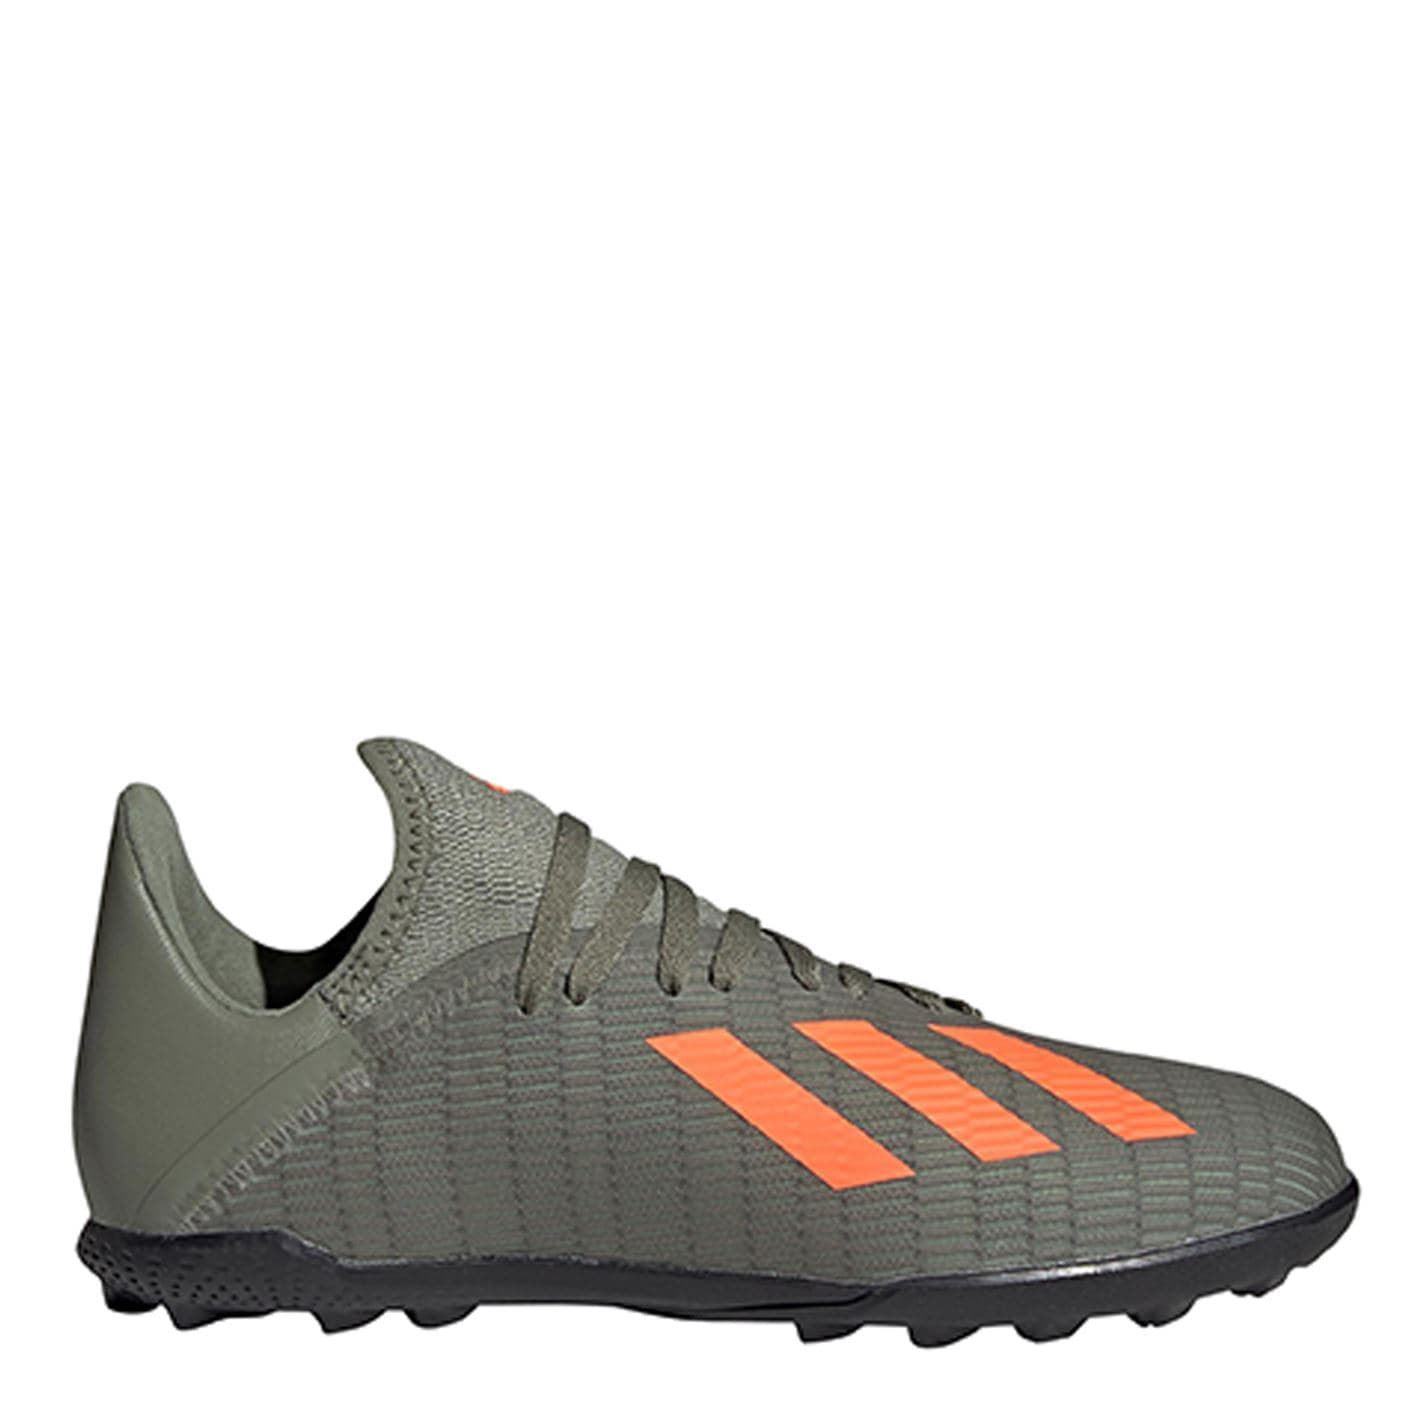 adidas Astro Turf Trainers Football